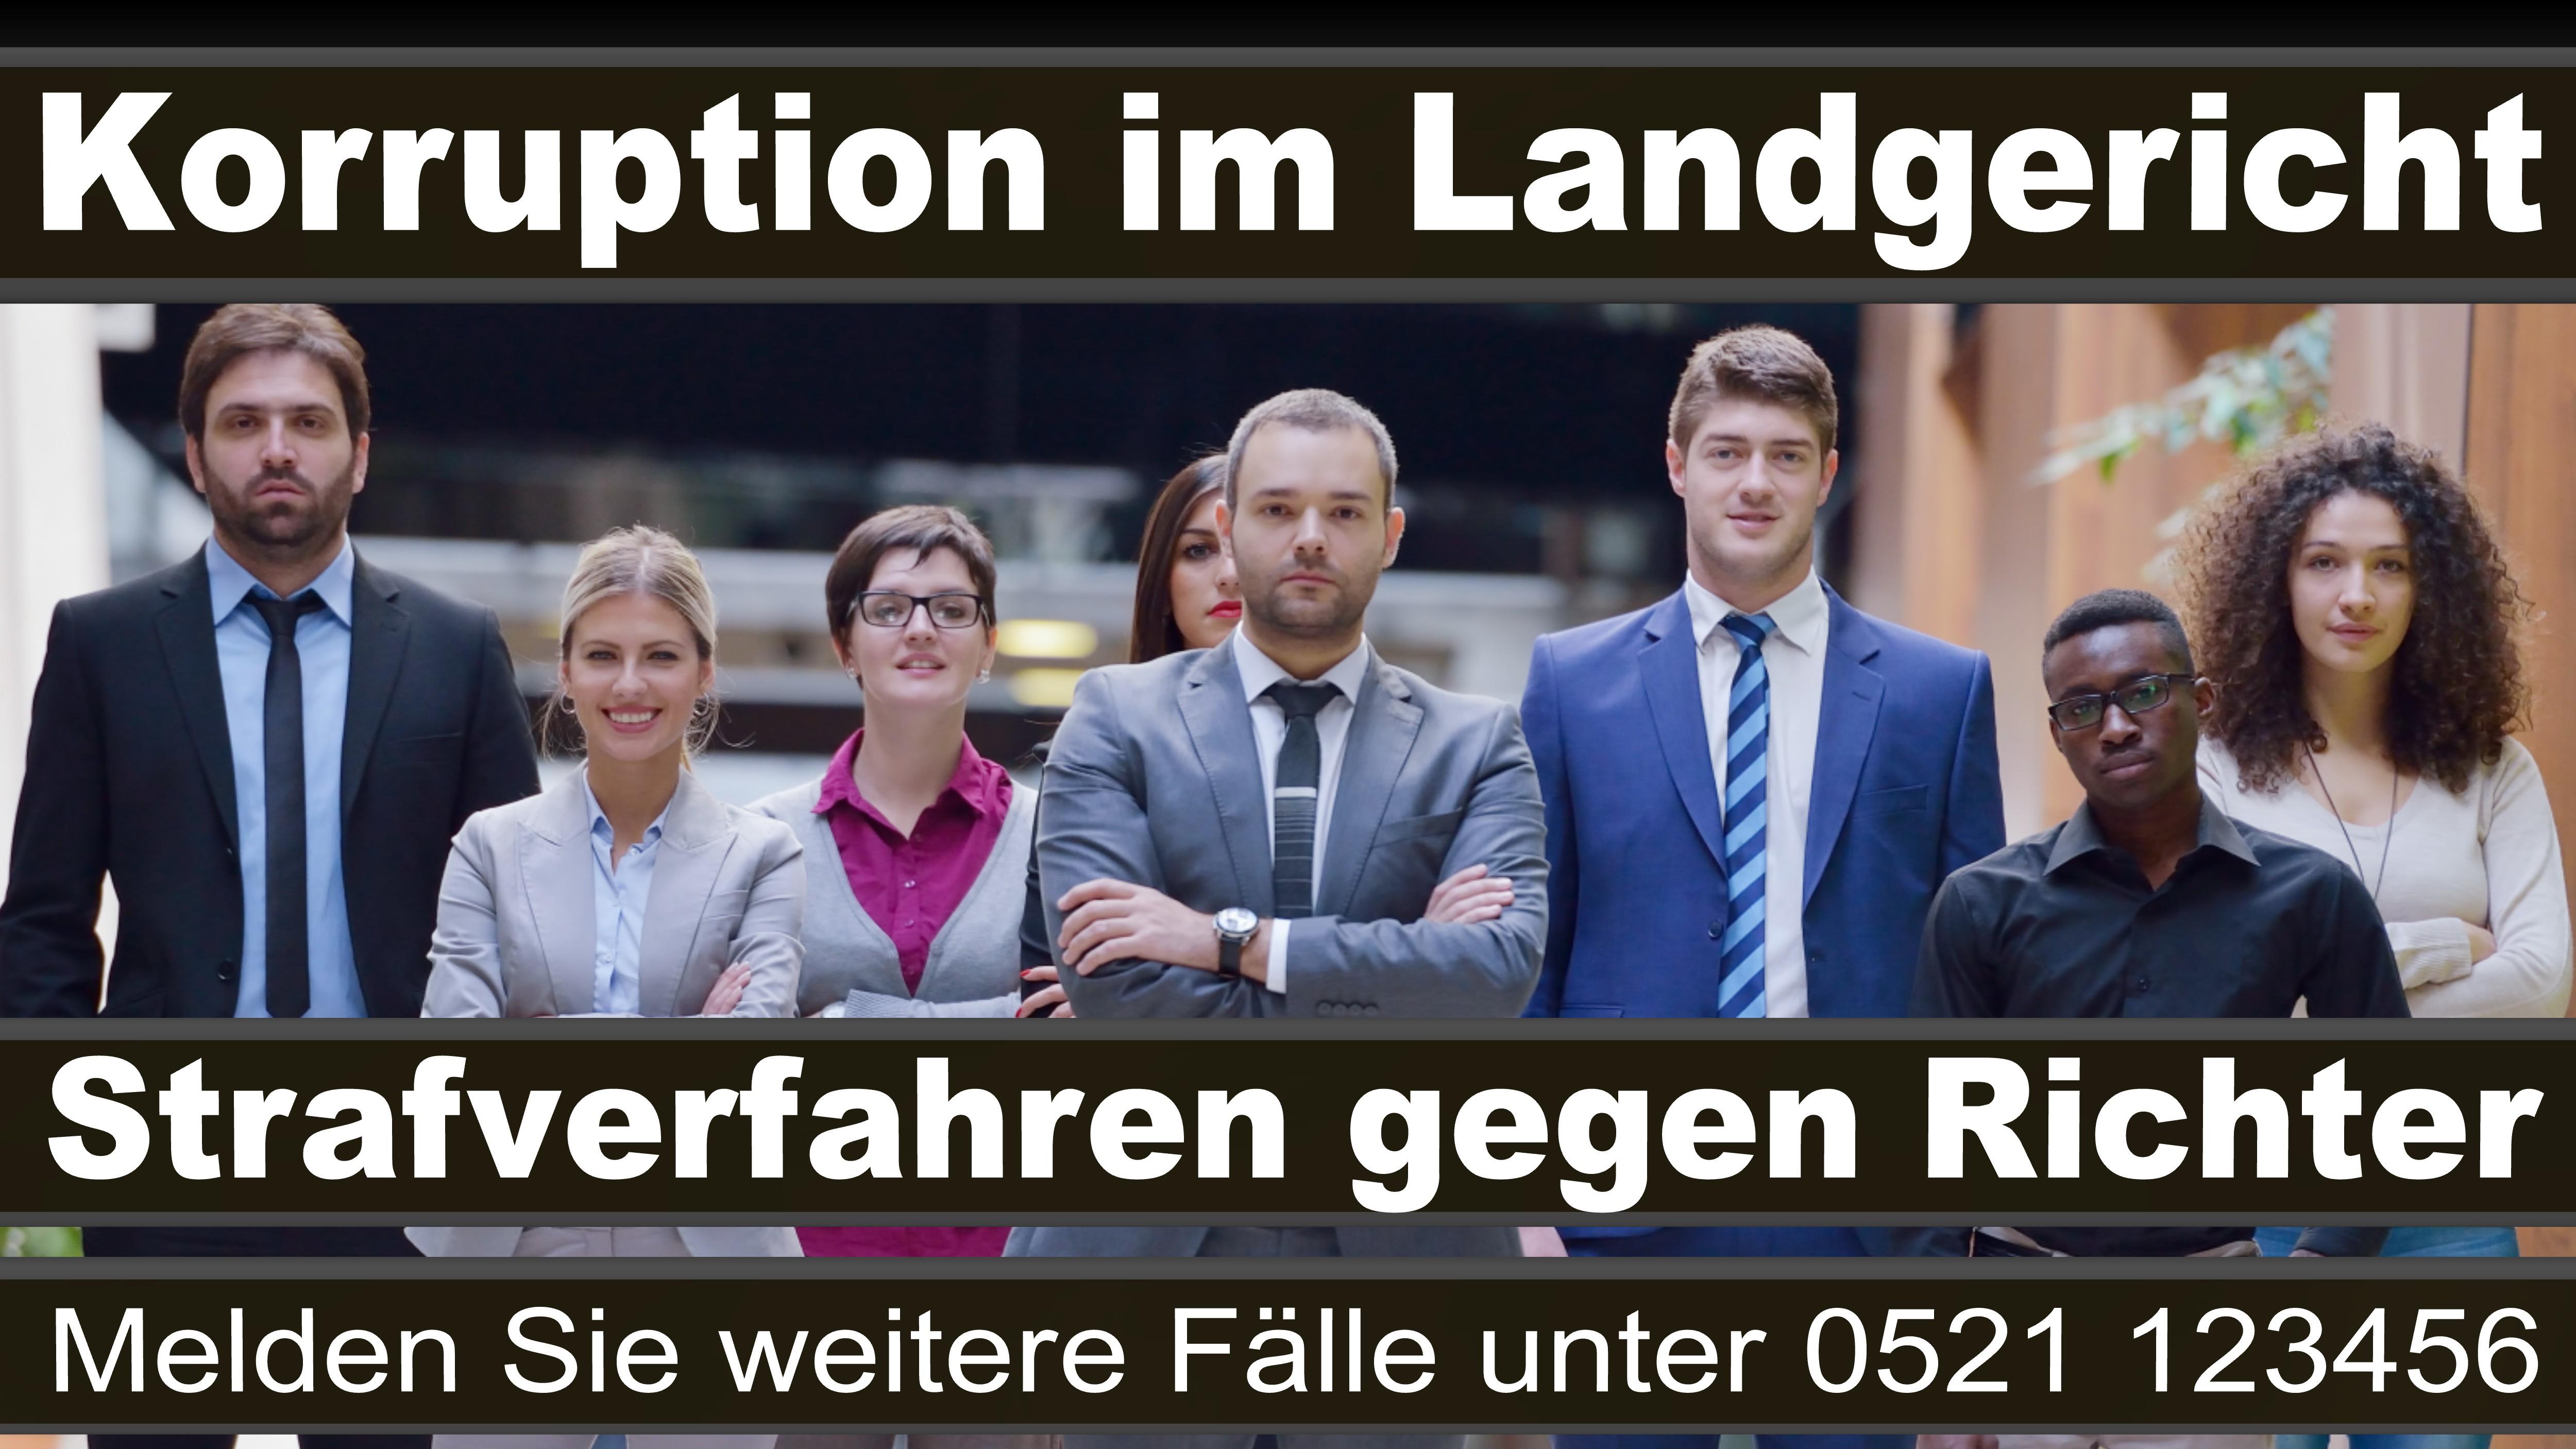 Korruption, Rechtsbeugung, Parteiverrat, Rechtsanwalt, Justiz, Präsident, Direktor, Leitender Oberstaatsanwalt, Verwaltungsgericht Leipzig